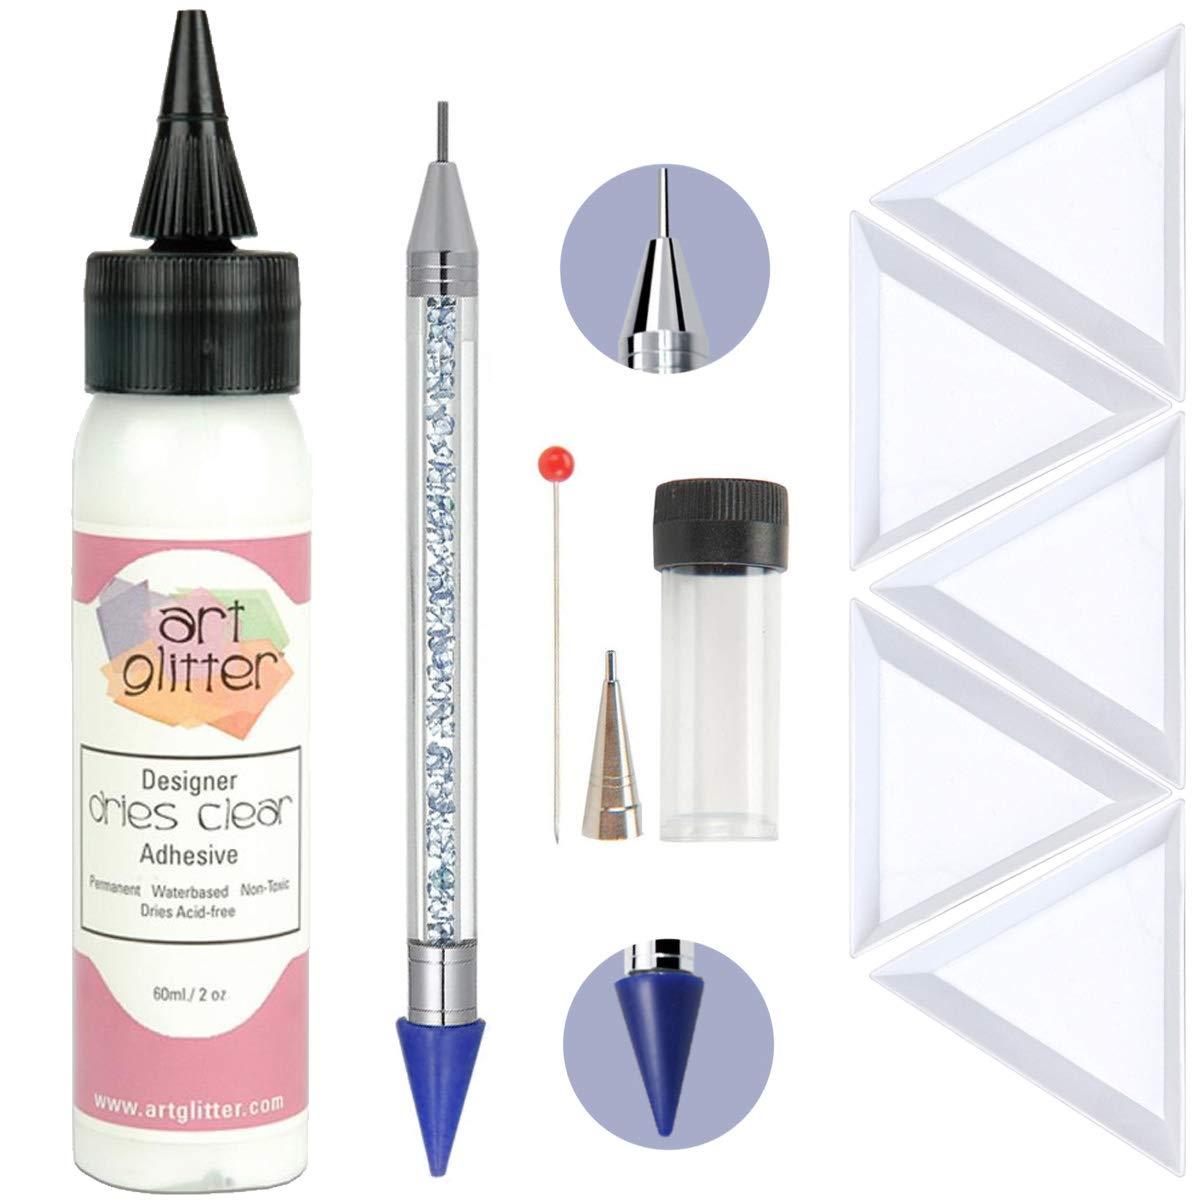 Art Glitter Glue Designer Dries Clear Adhesive 2-ounce with Ultra Fine Metal Tip, Pixiss 6-inch Jewel Picker Setter Pickup Tool, 5x Triangle Bead Trays Wax Pencil Rhinestone Applicator Application Kit